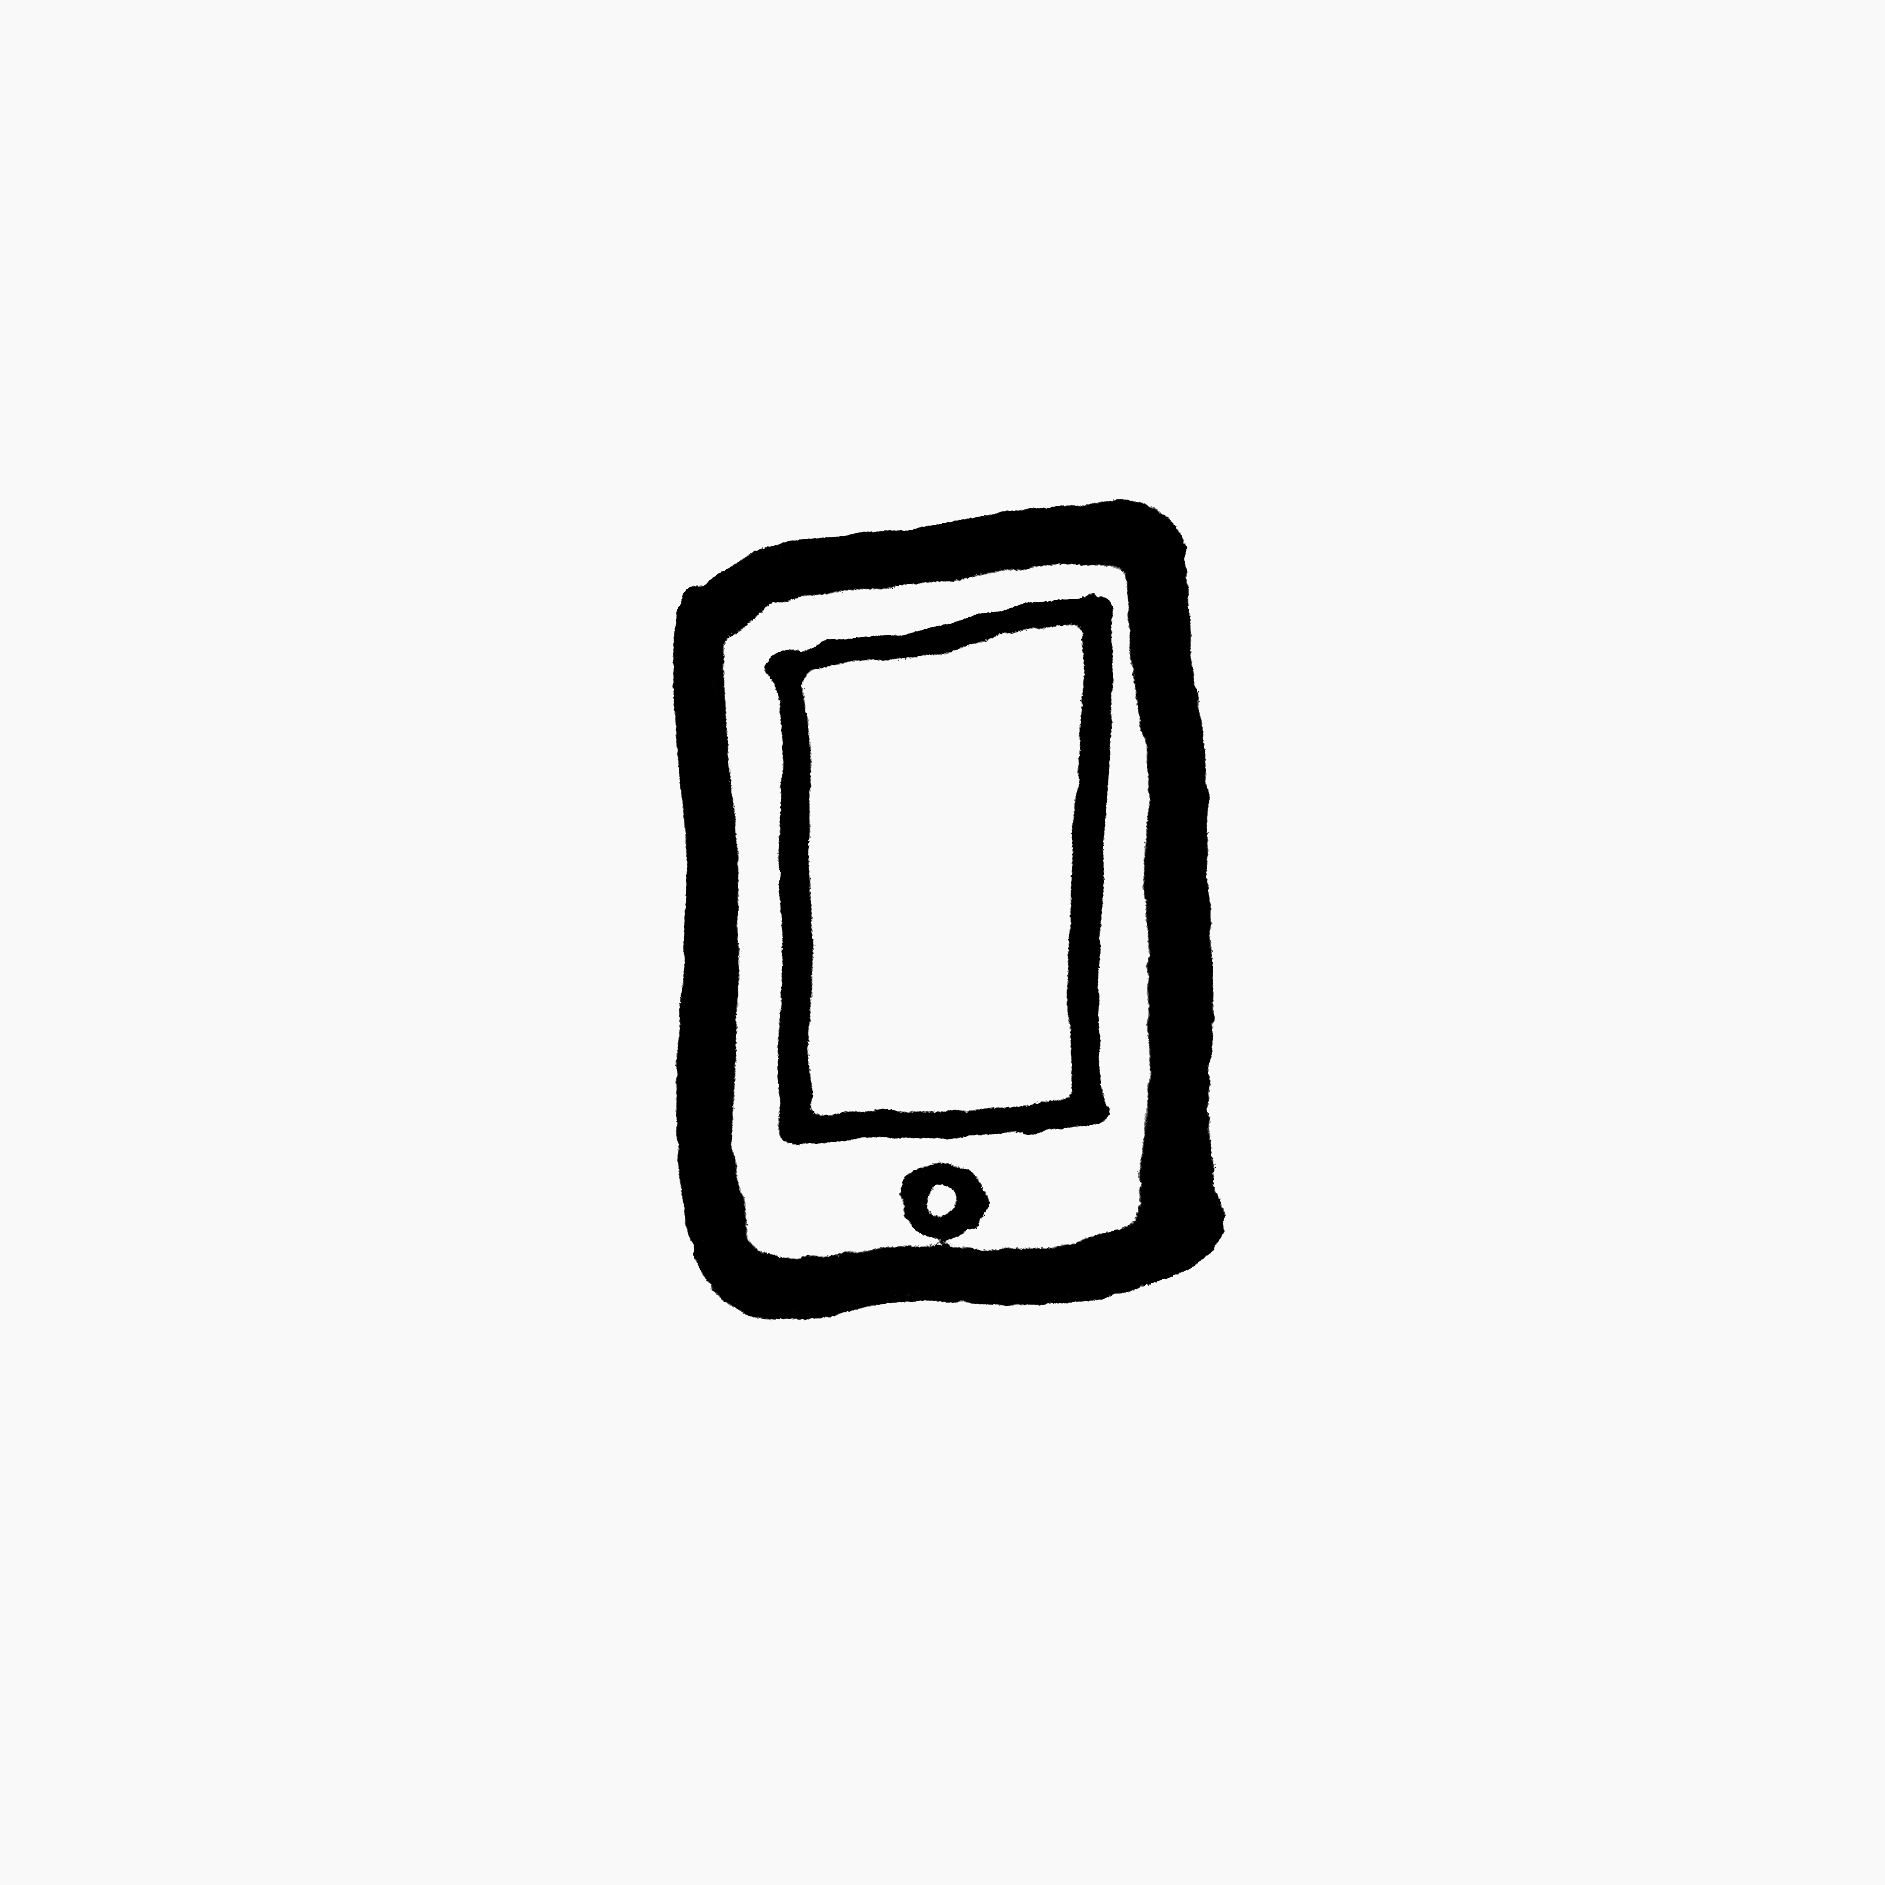 Phone_1.jpg